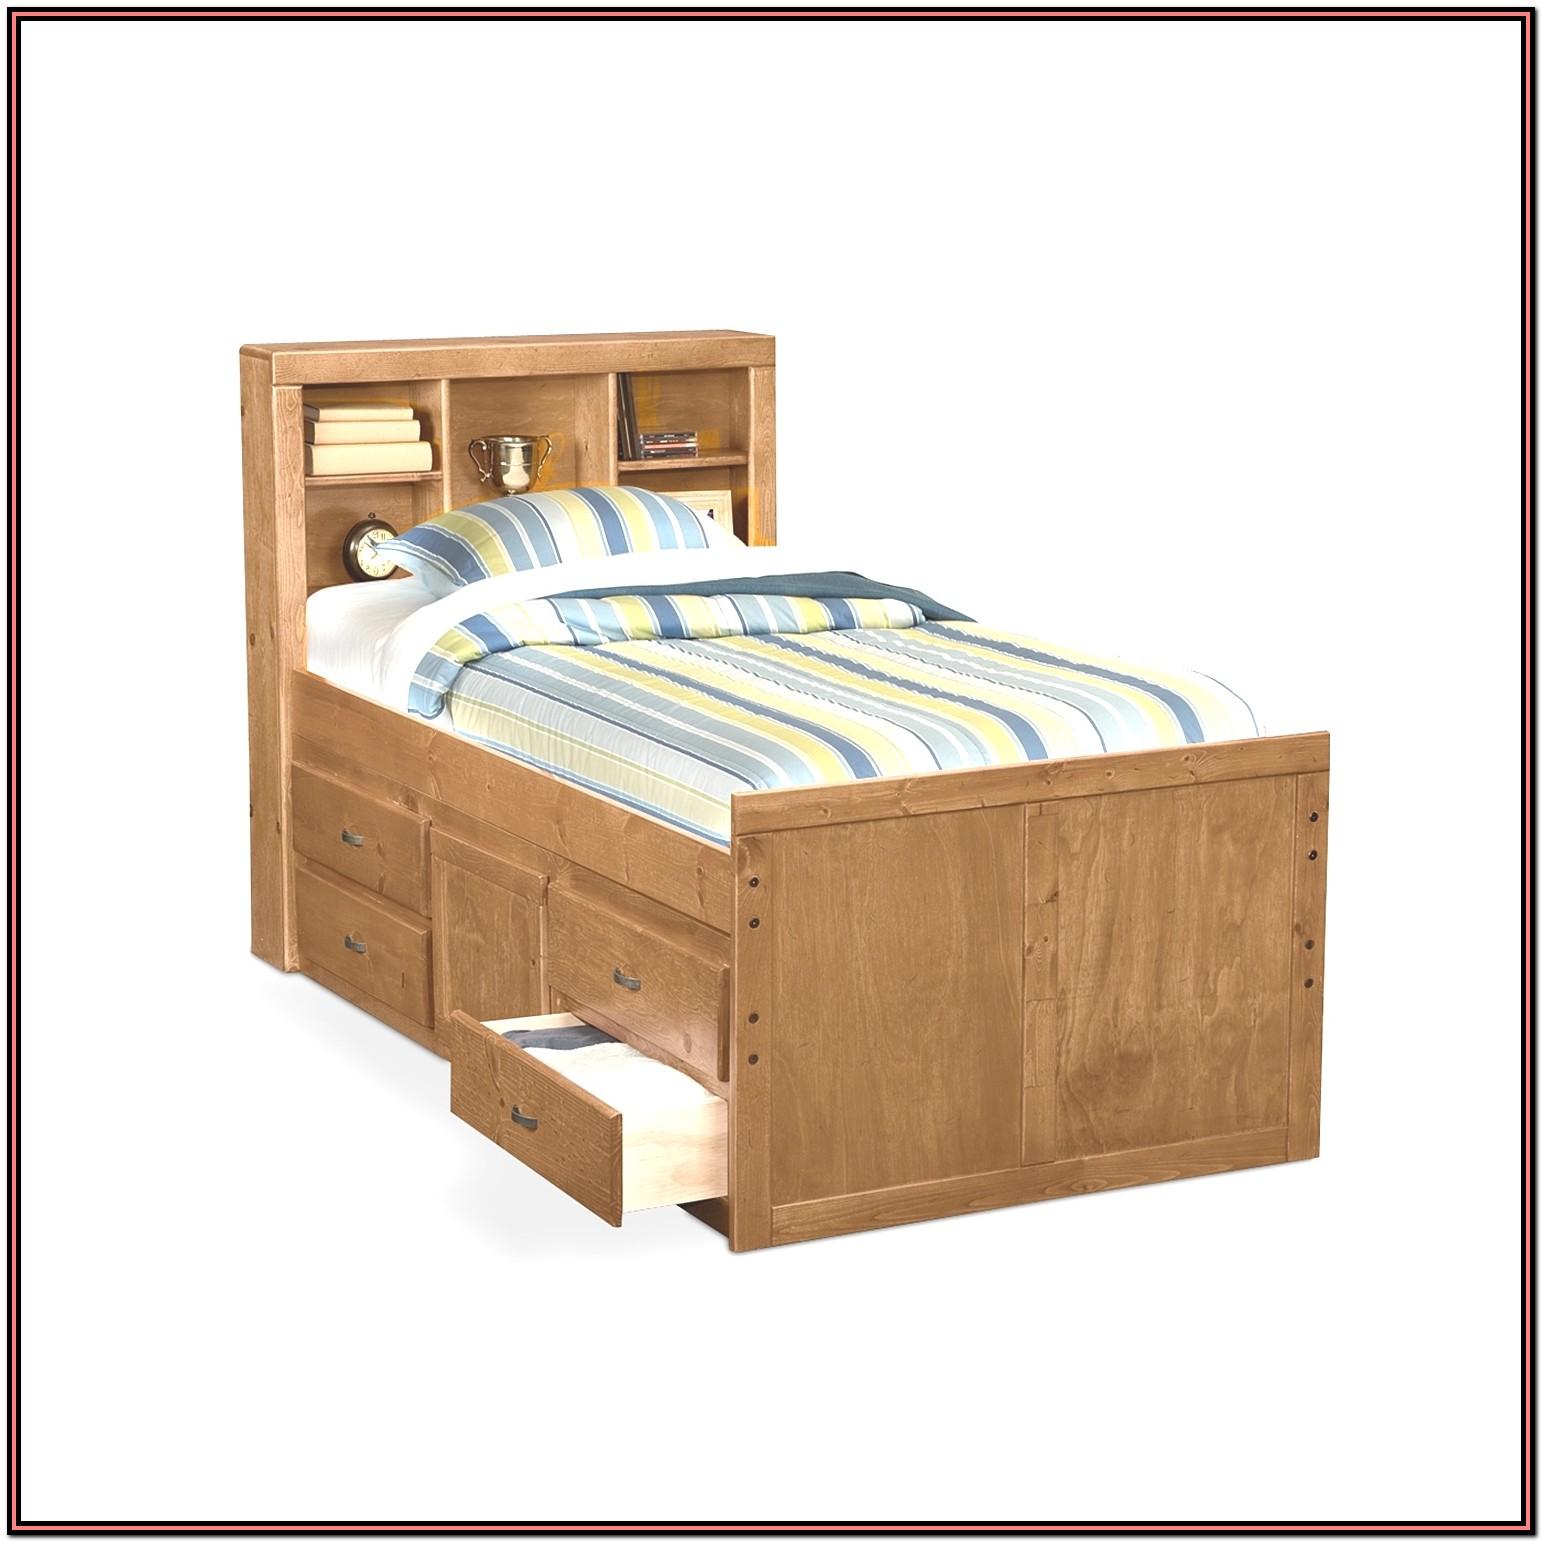 Platform Bed With Drawers Design Plans